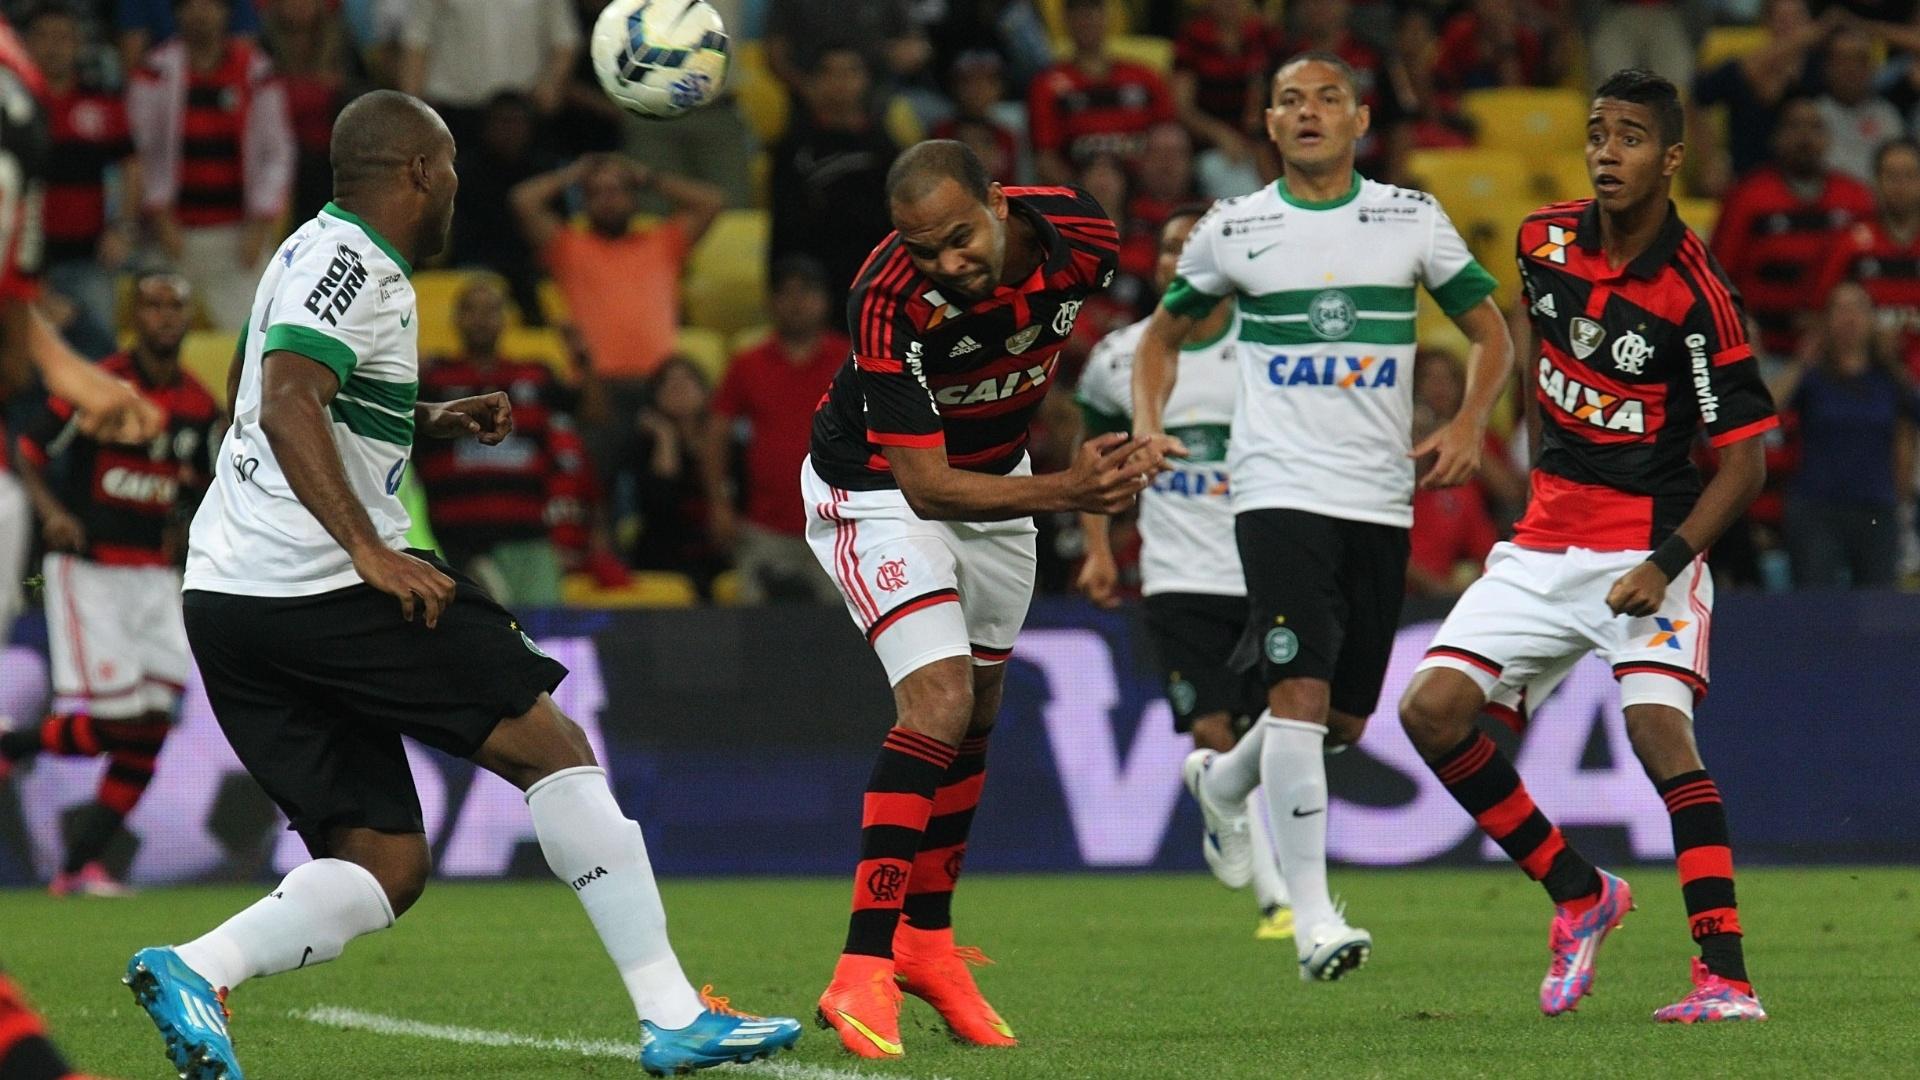 Alecsandro desvia bola de cabeça na partida entre Flamengo e Coritiba